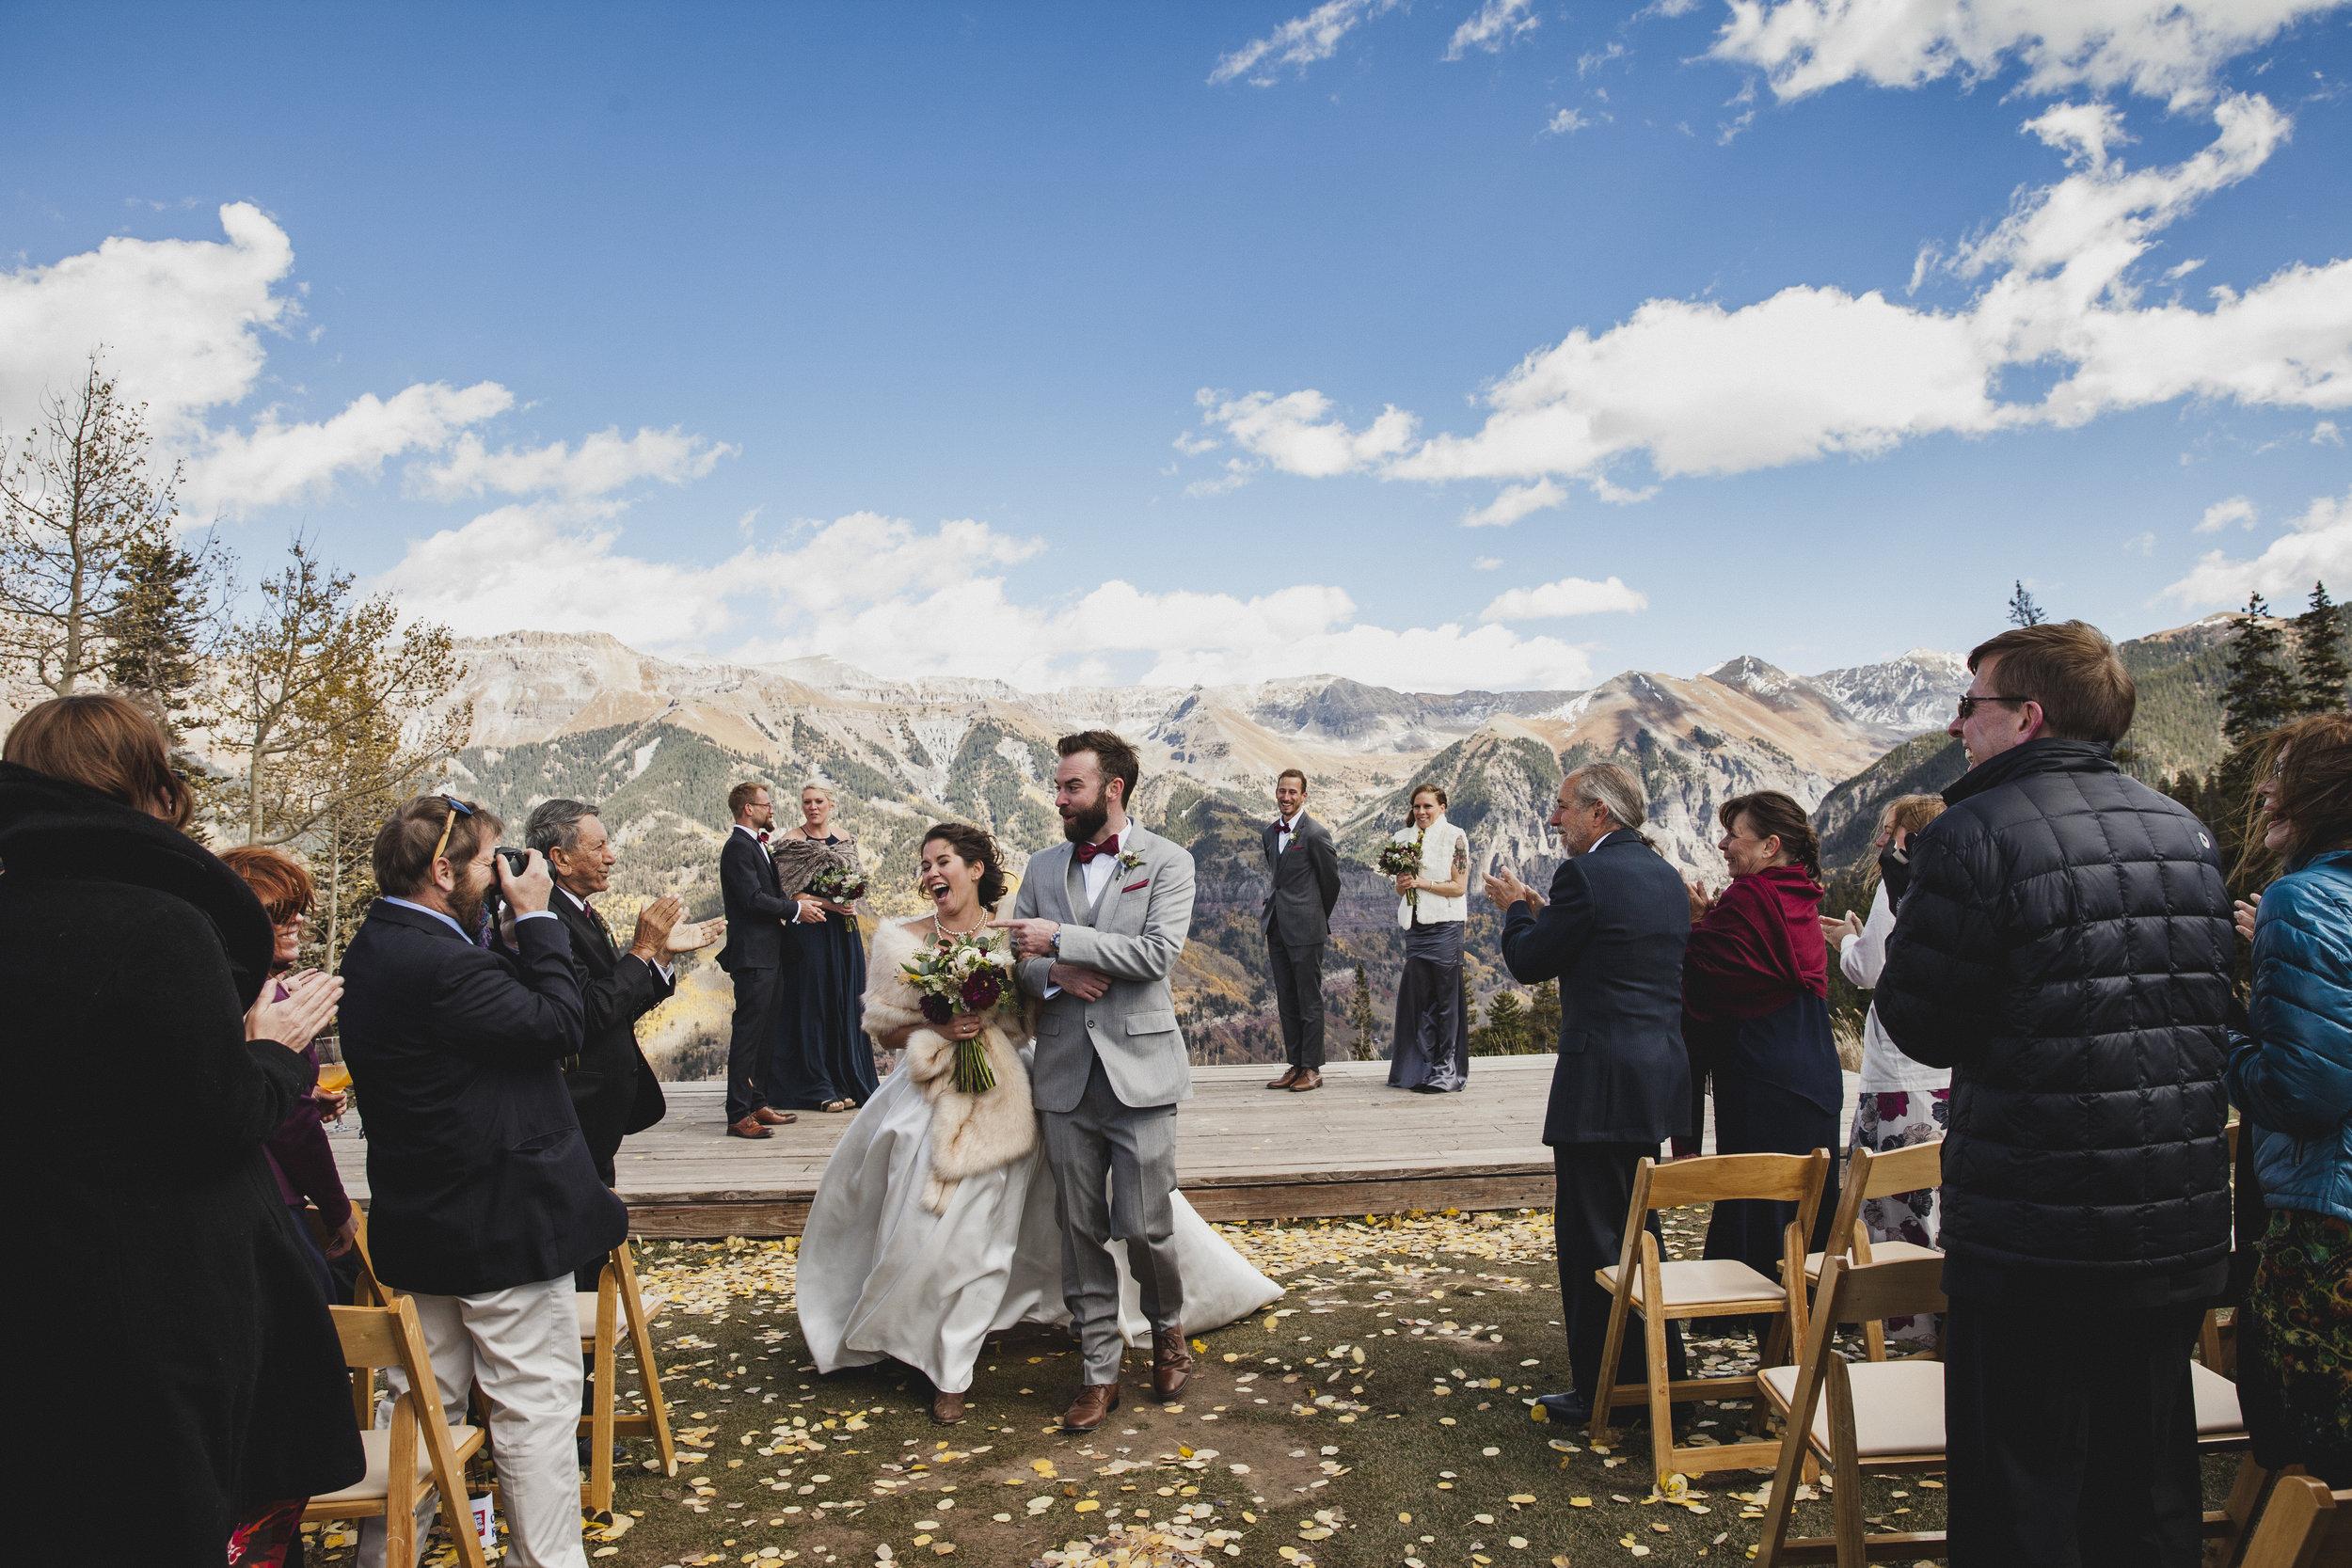 NE-LeahandAshtonphotography-Telluride-Wedding-Photography-6872.jpg